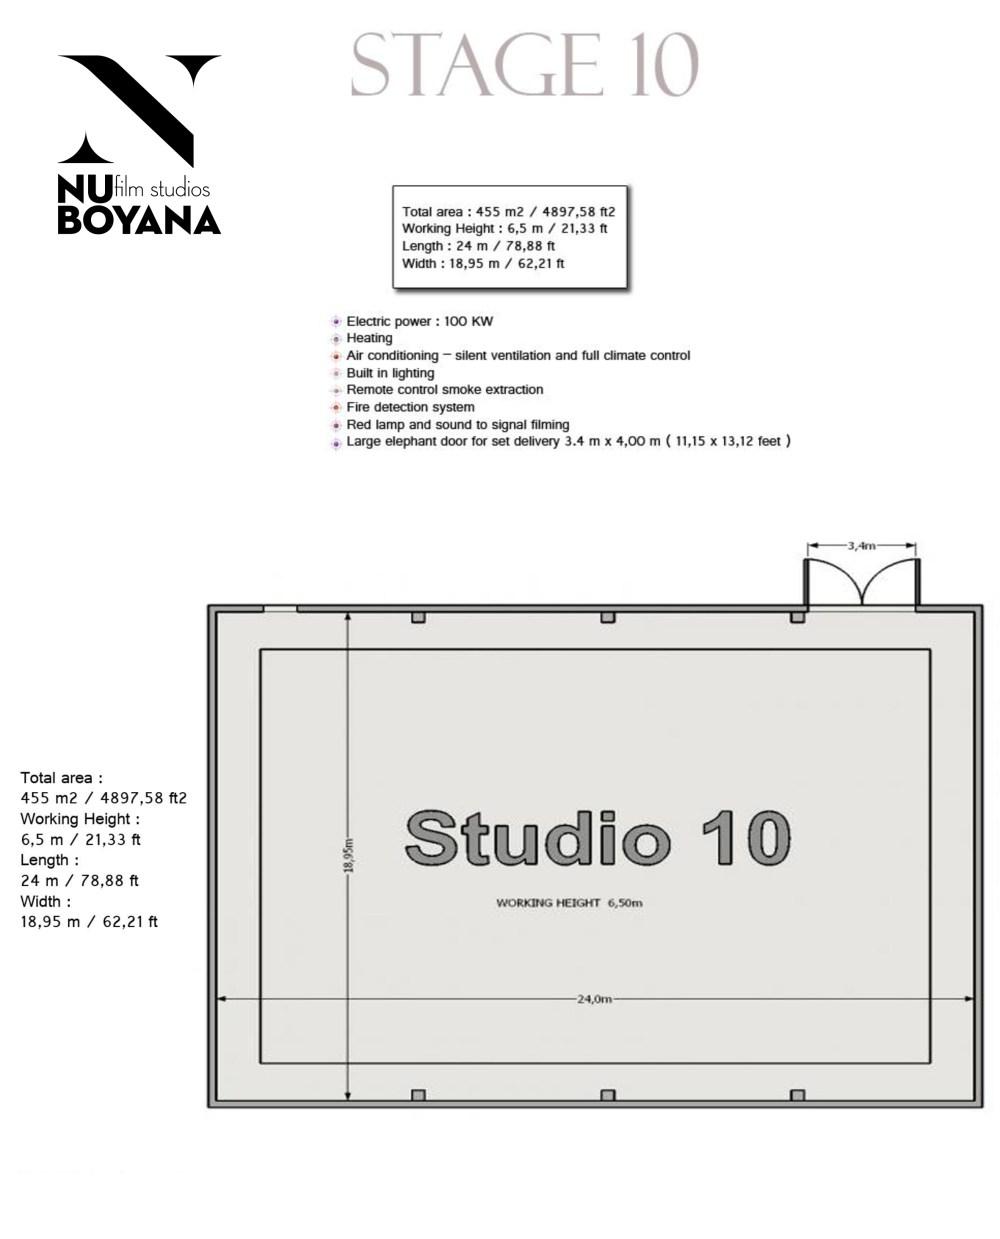 medium resolution of sound stage 10 455m2